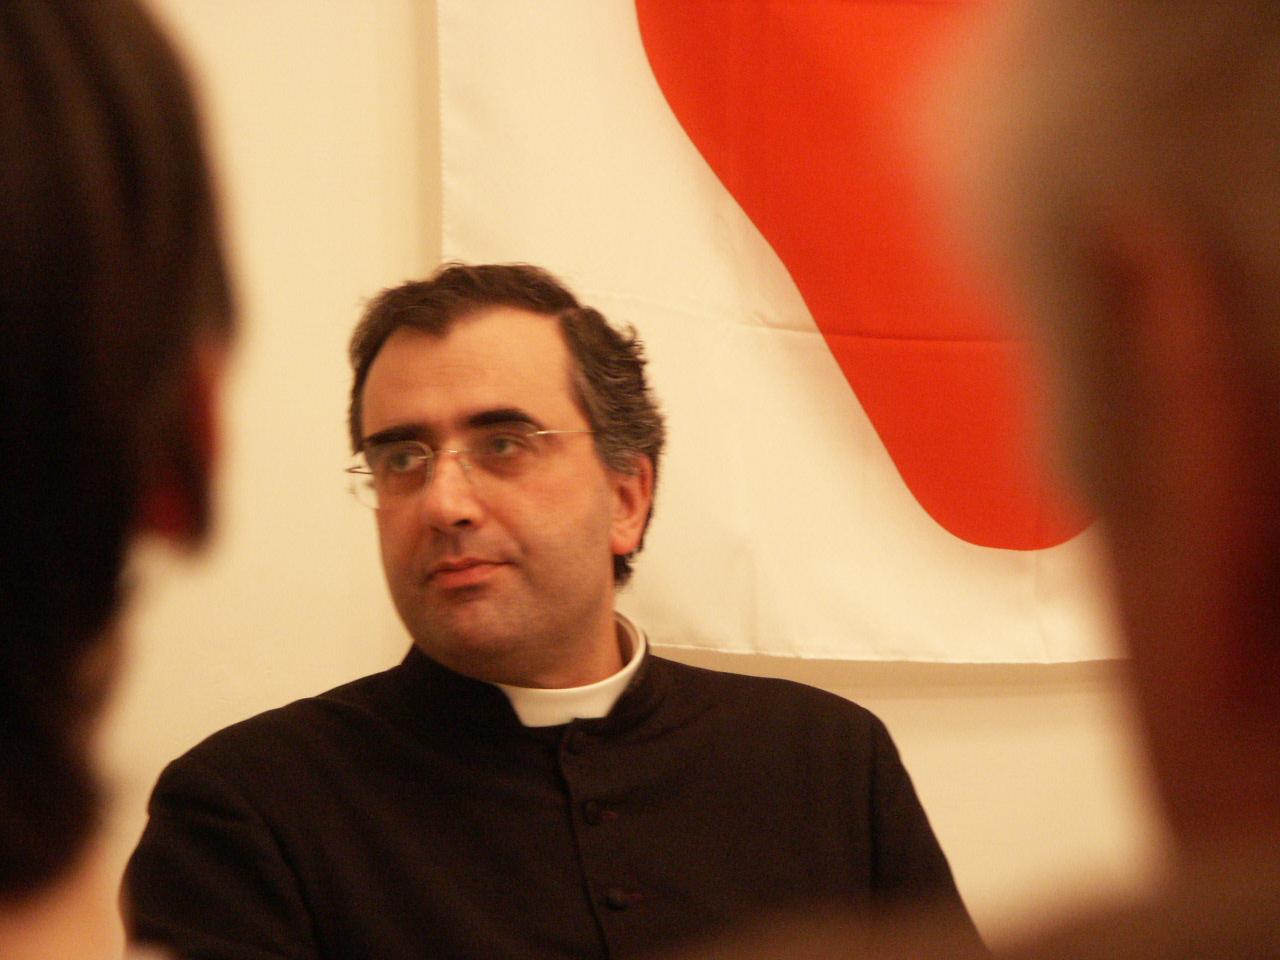 http://www.wakeupnews.eu/wp-content/uploads/2013/02/sedevacantisti-conclave-2013-mater-boni-consilii-francesco-ricossa.jpg